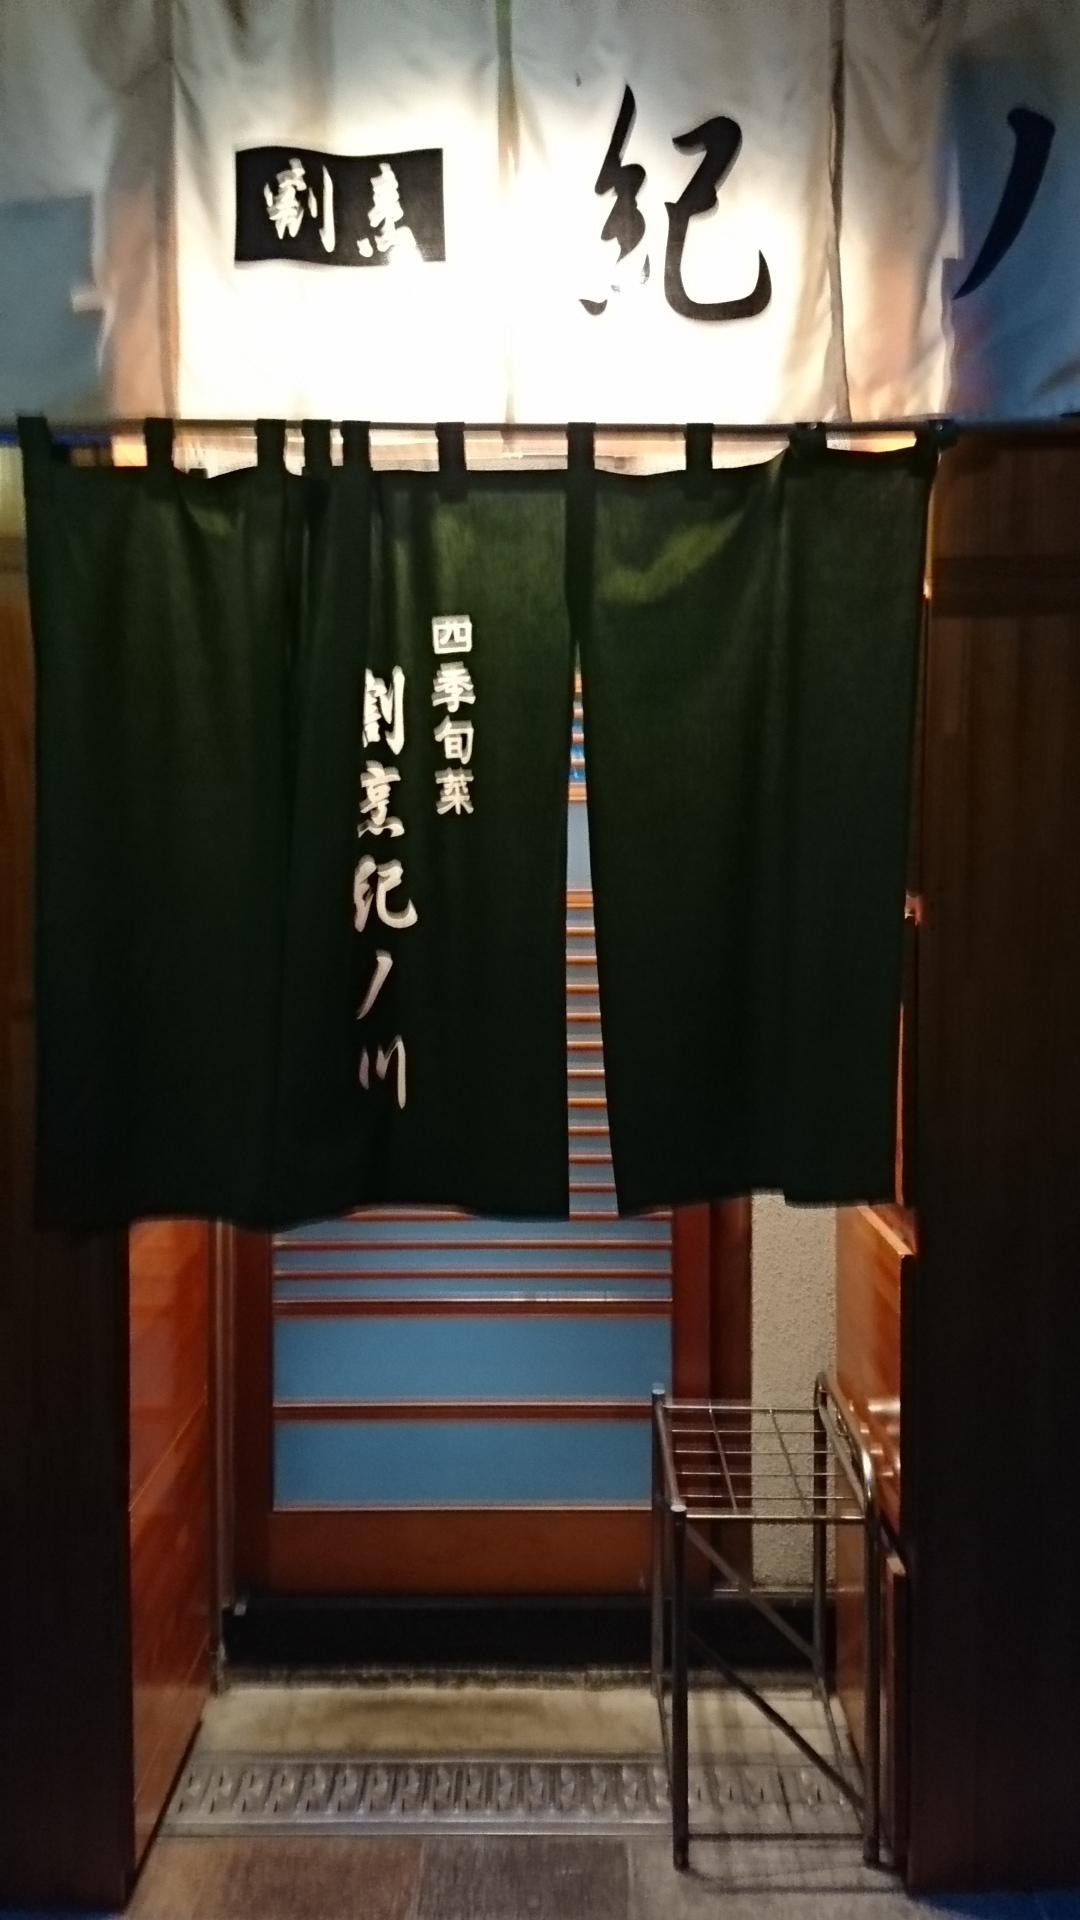 2017.6.3 豊岡 (115) 紀ノ川 1080-1920